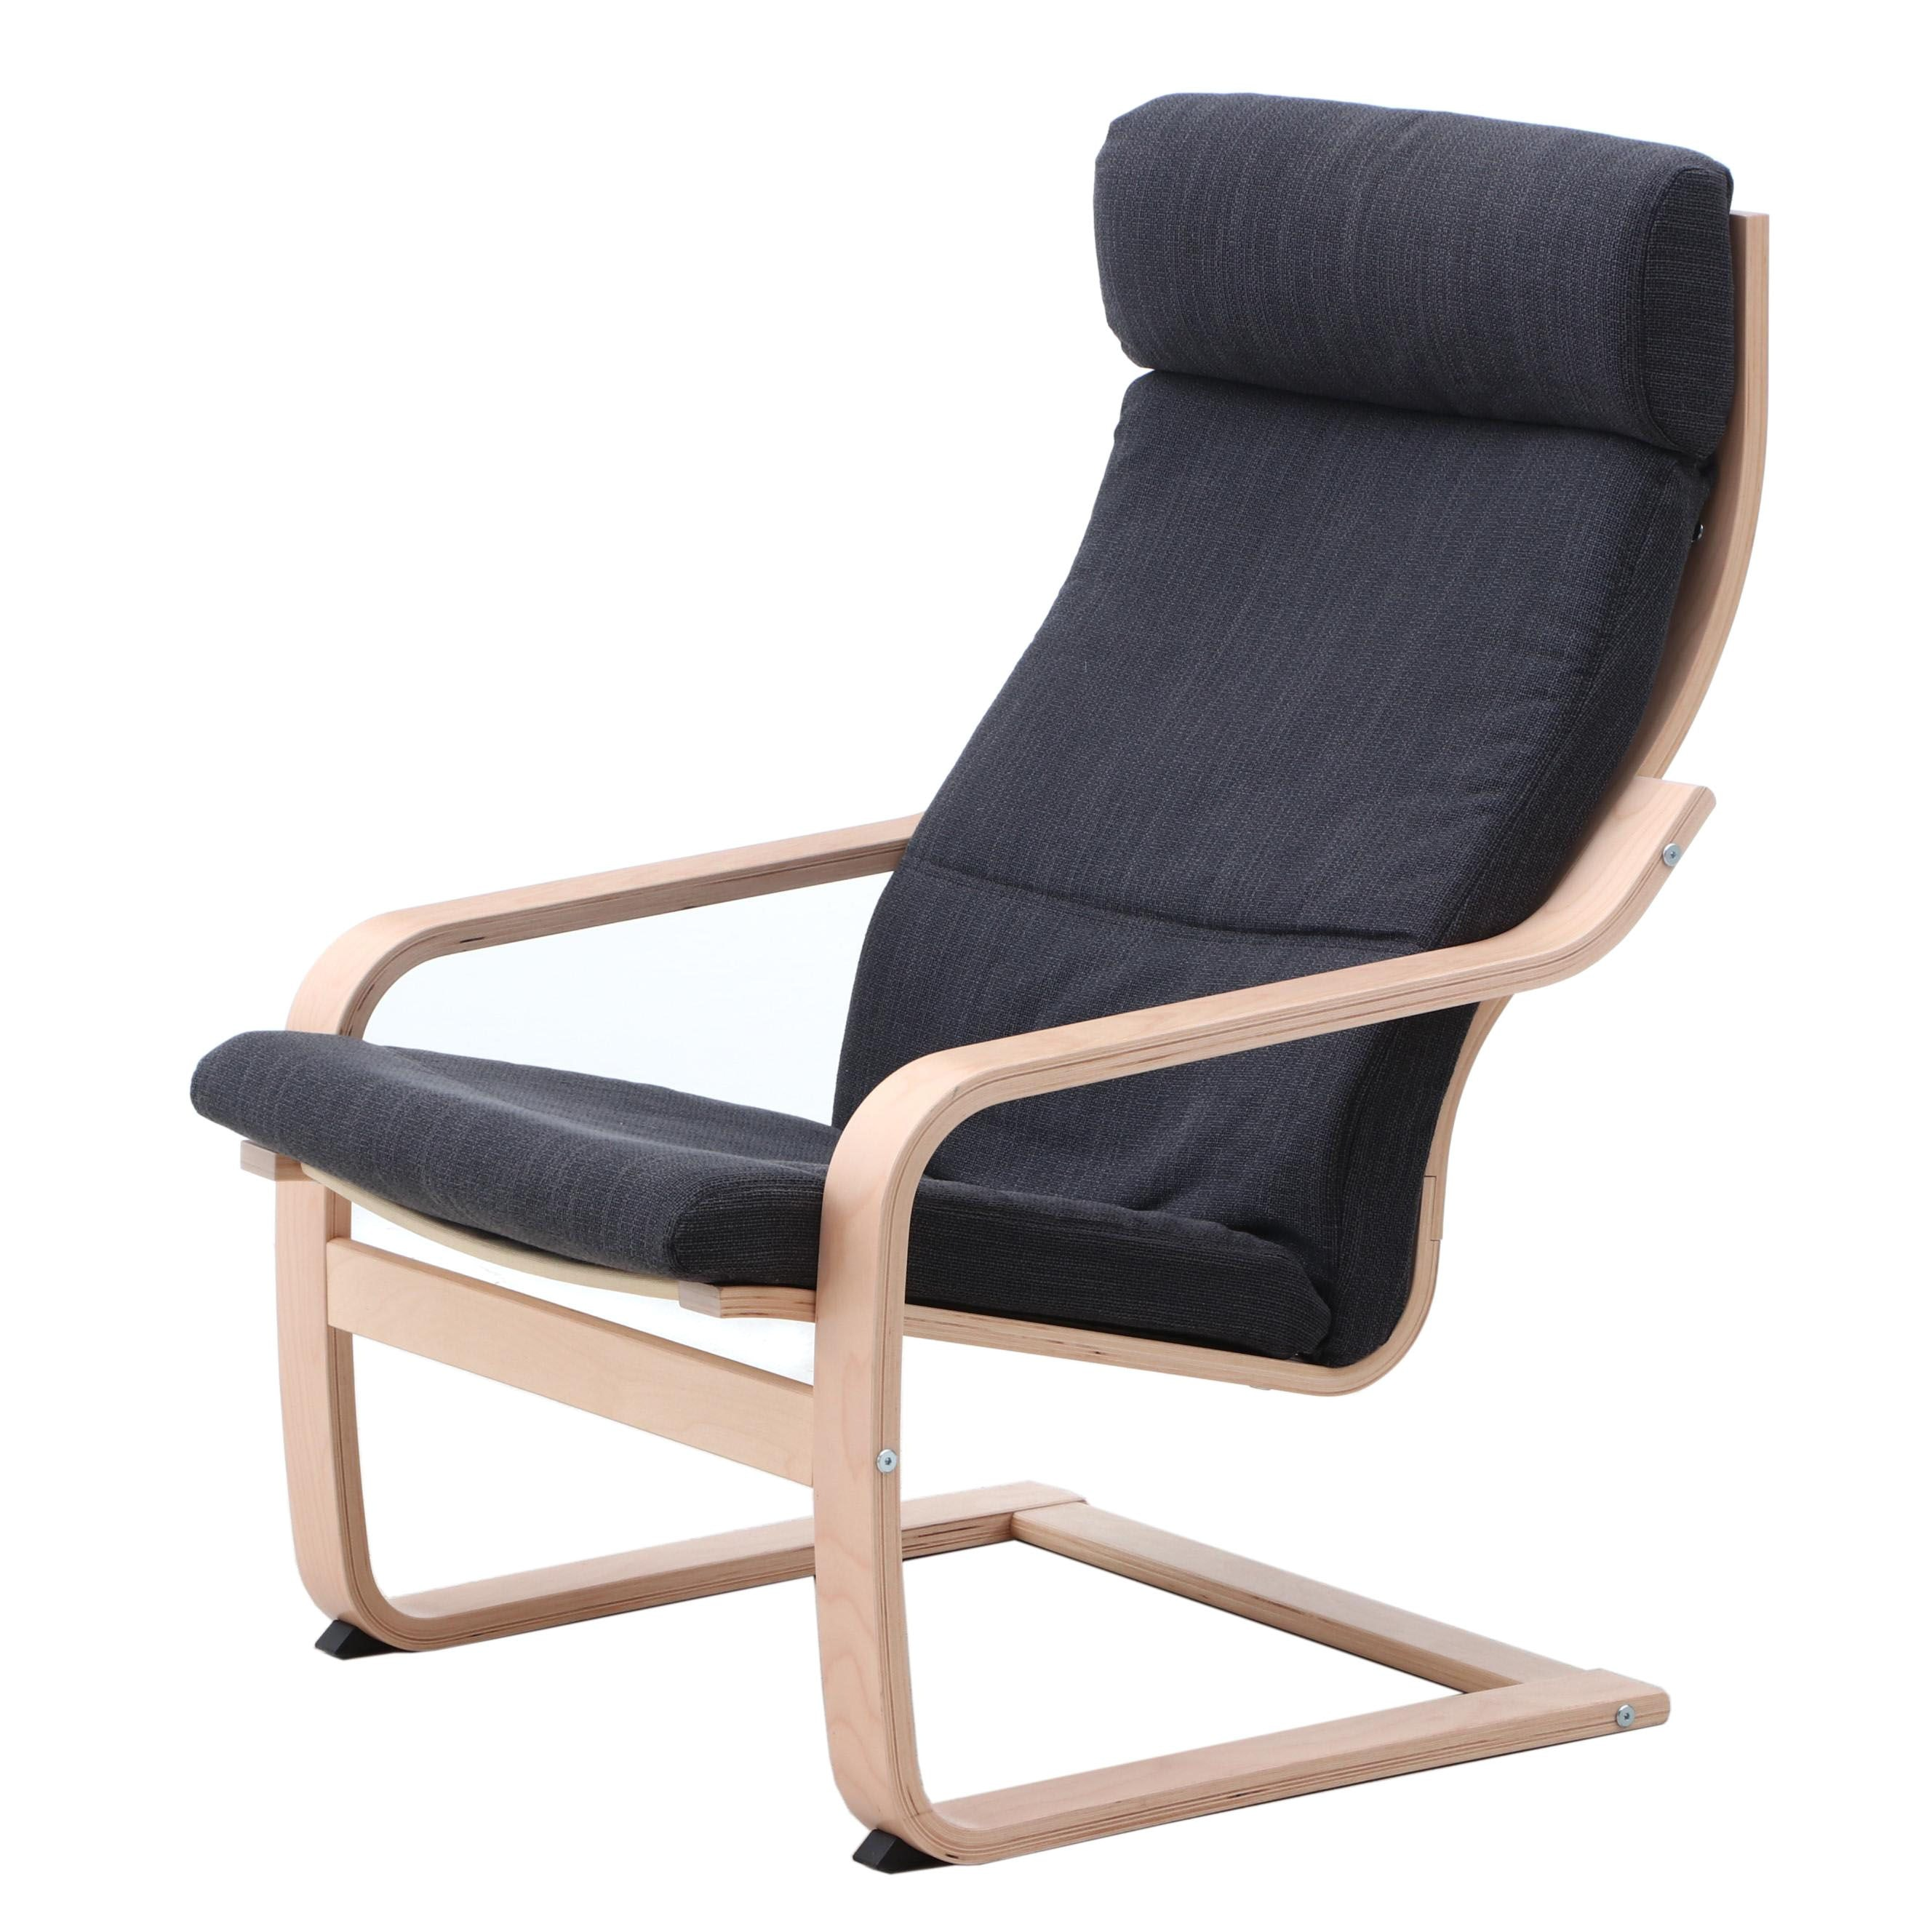 IKEA POÄNG Chair